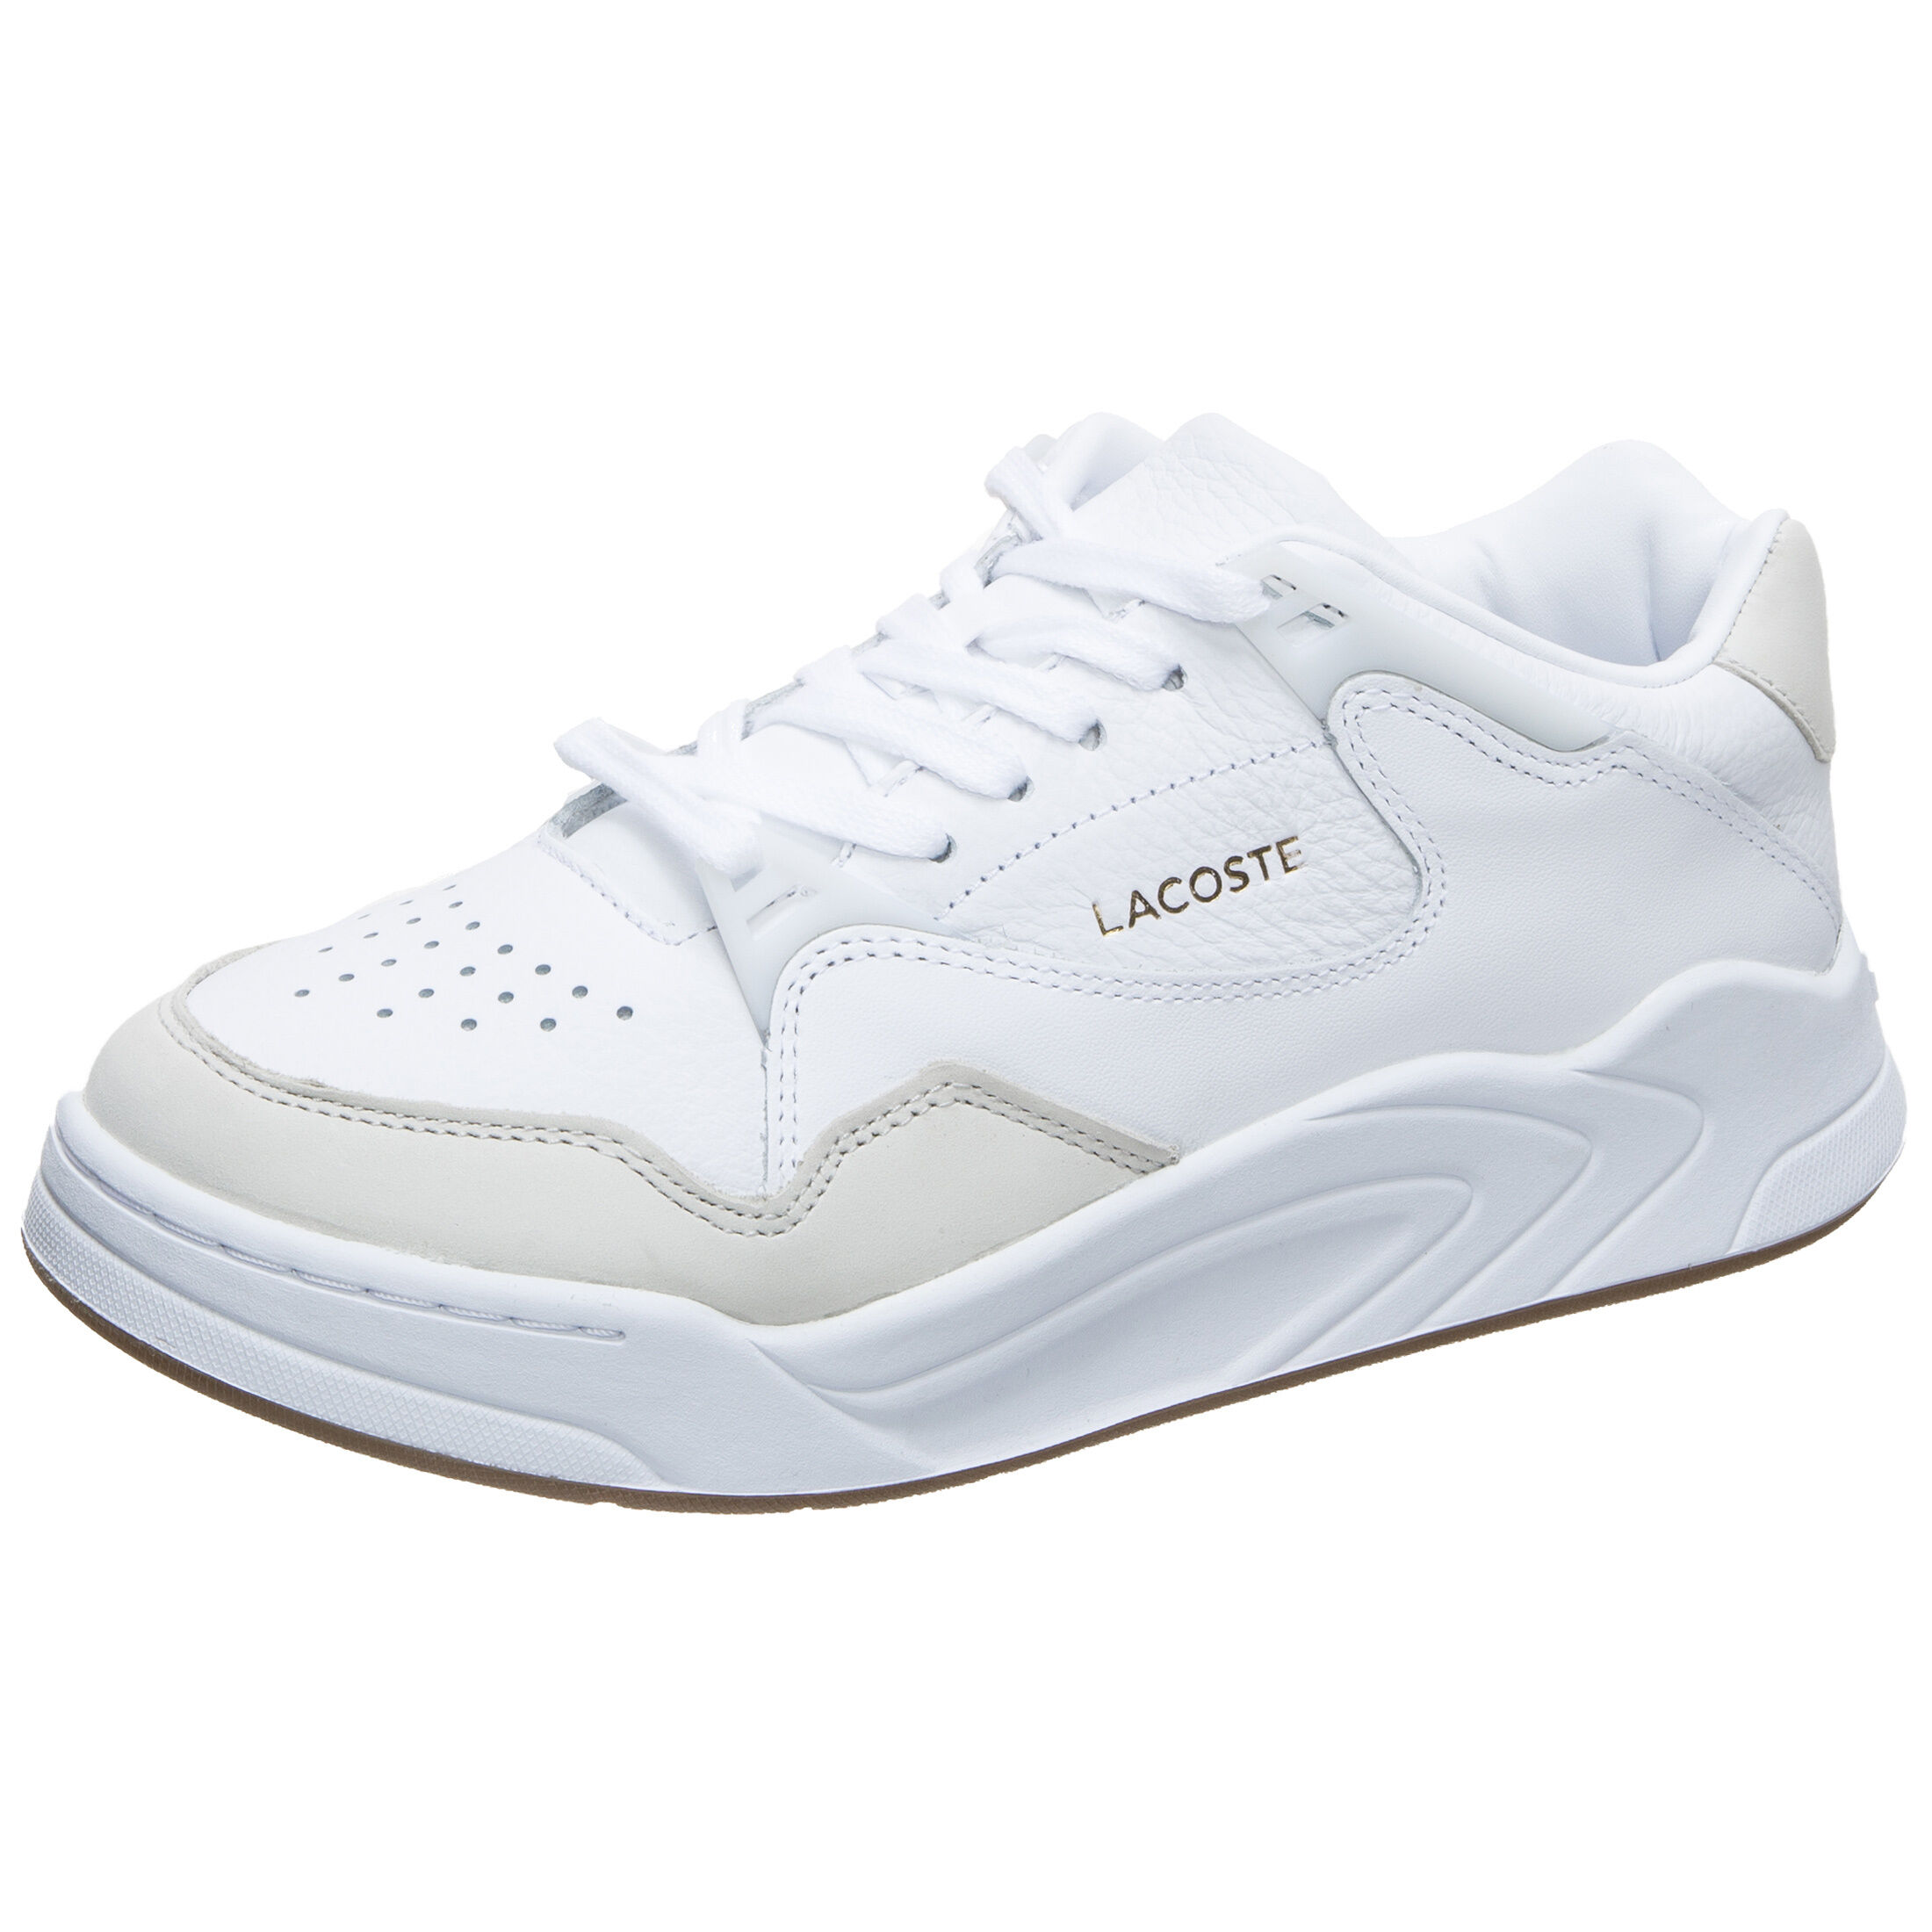 Sneaker Lacoste | Schuhe Frauen bei OUTFITTER